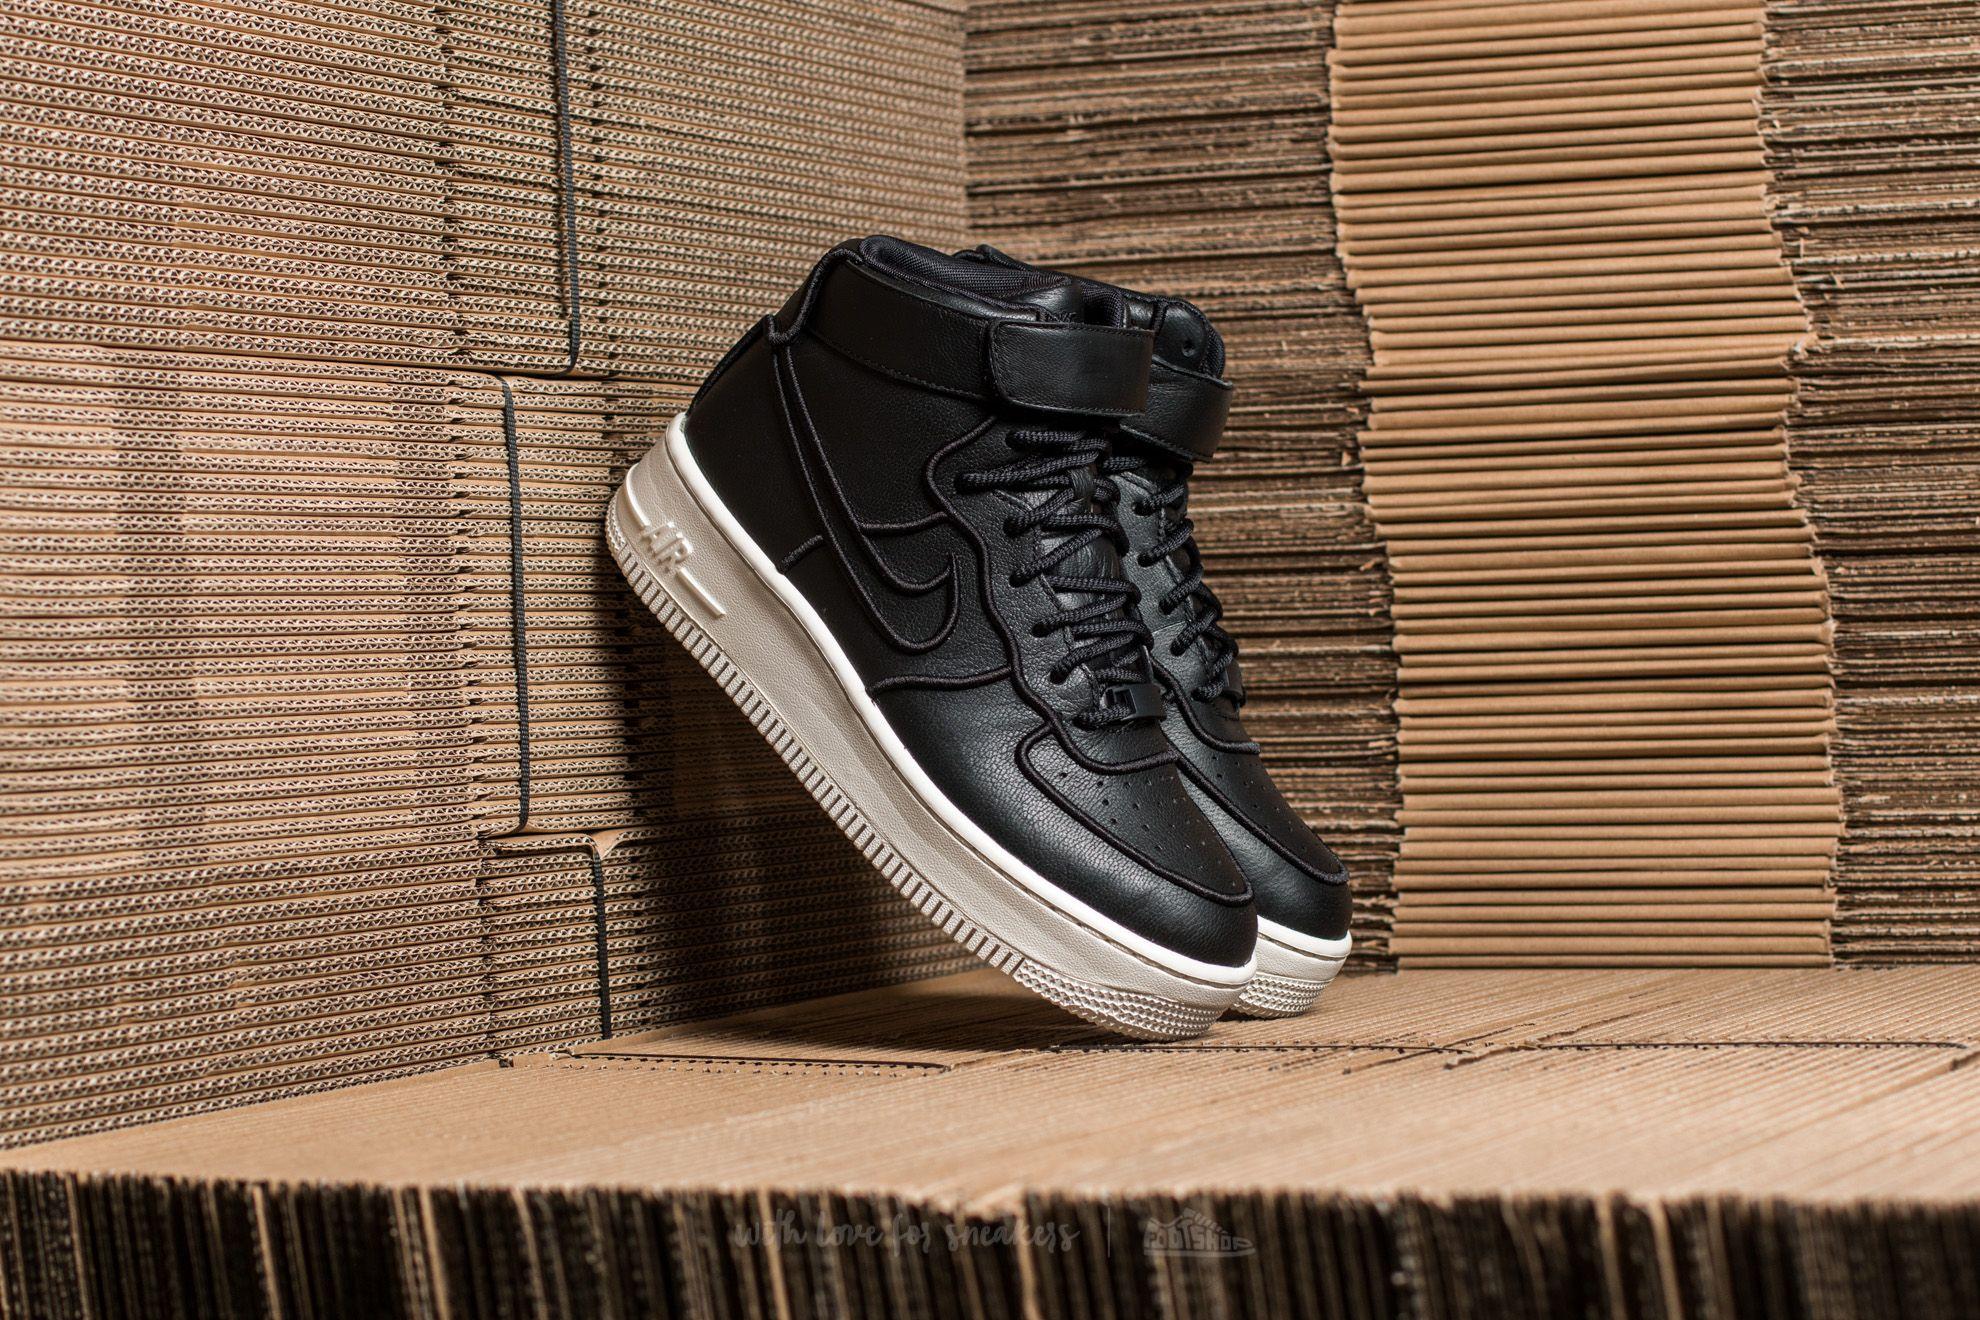 Nike Wmns Air Force 1 Upstep Hi SI Black/ Black-Ivory